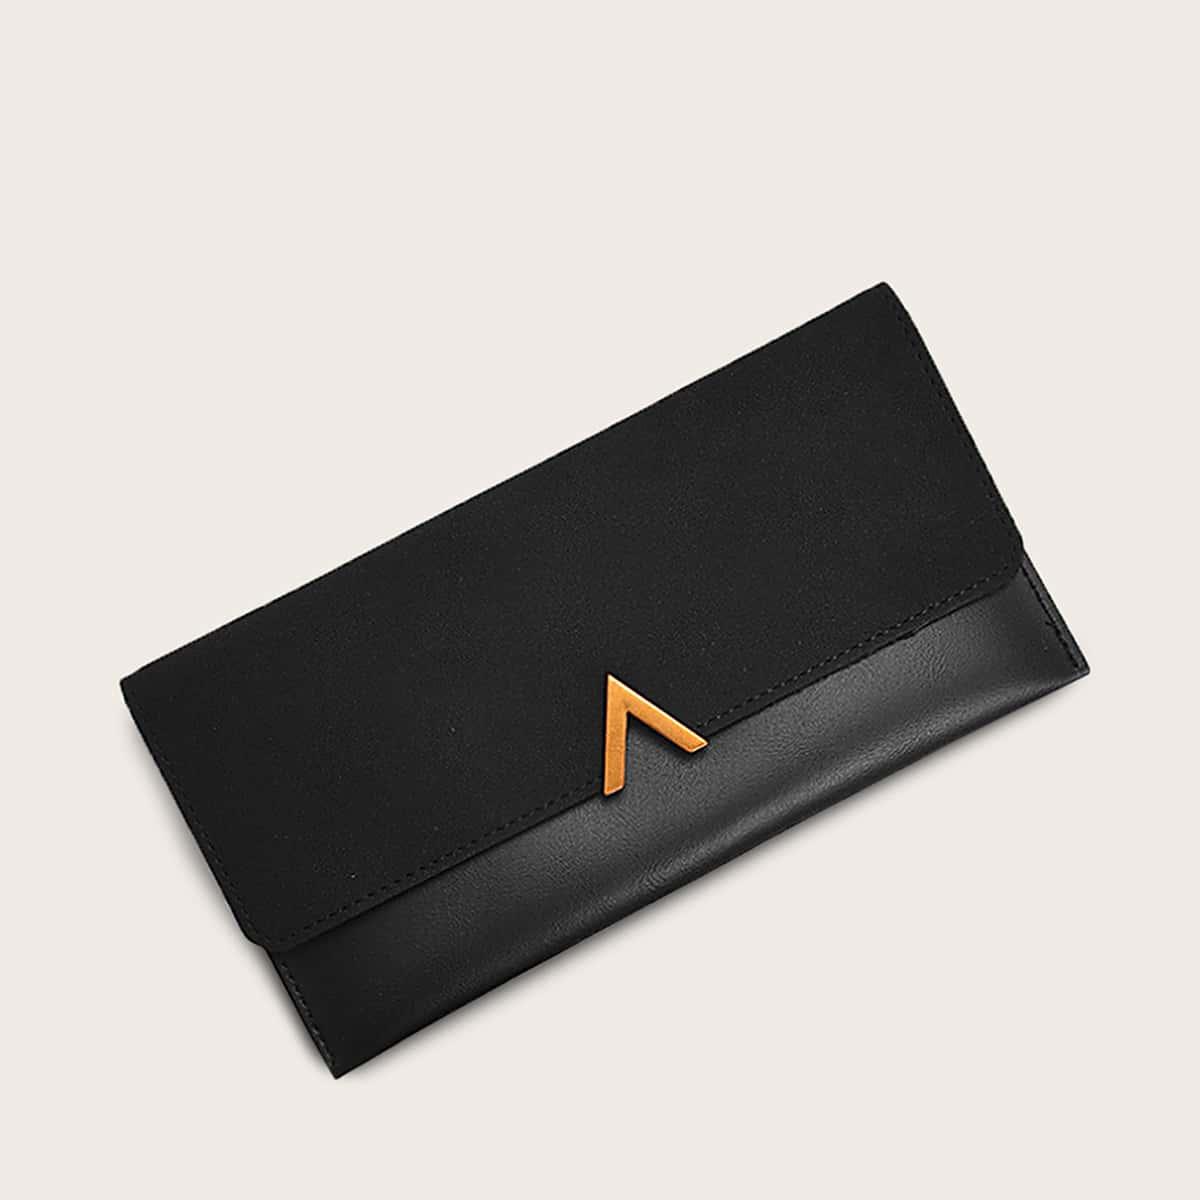 Минималистский складной кошелек с молнией от SHEIN